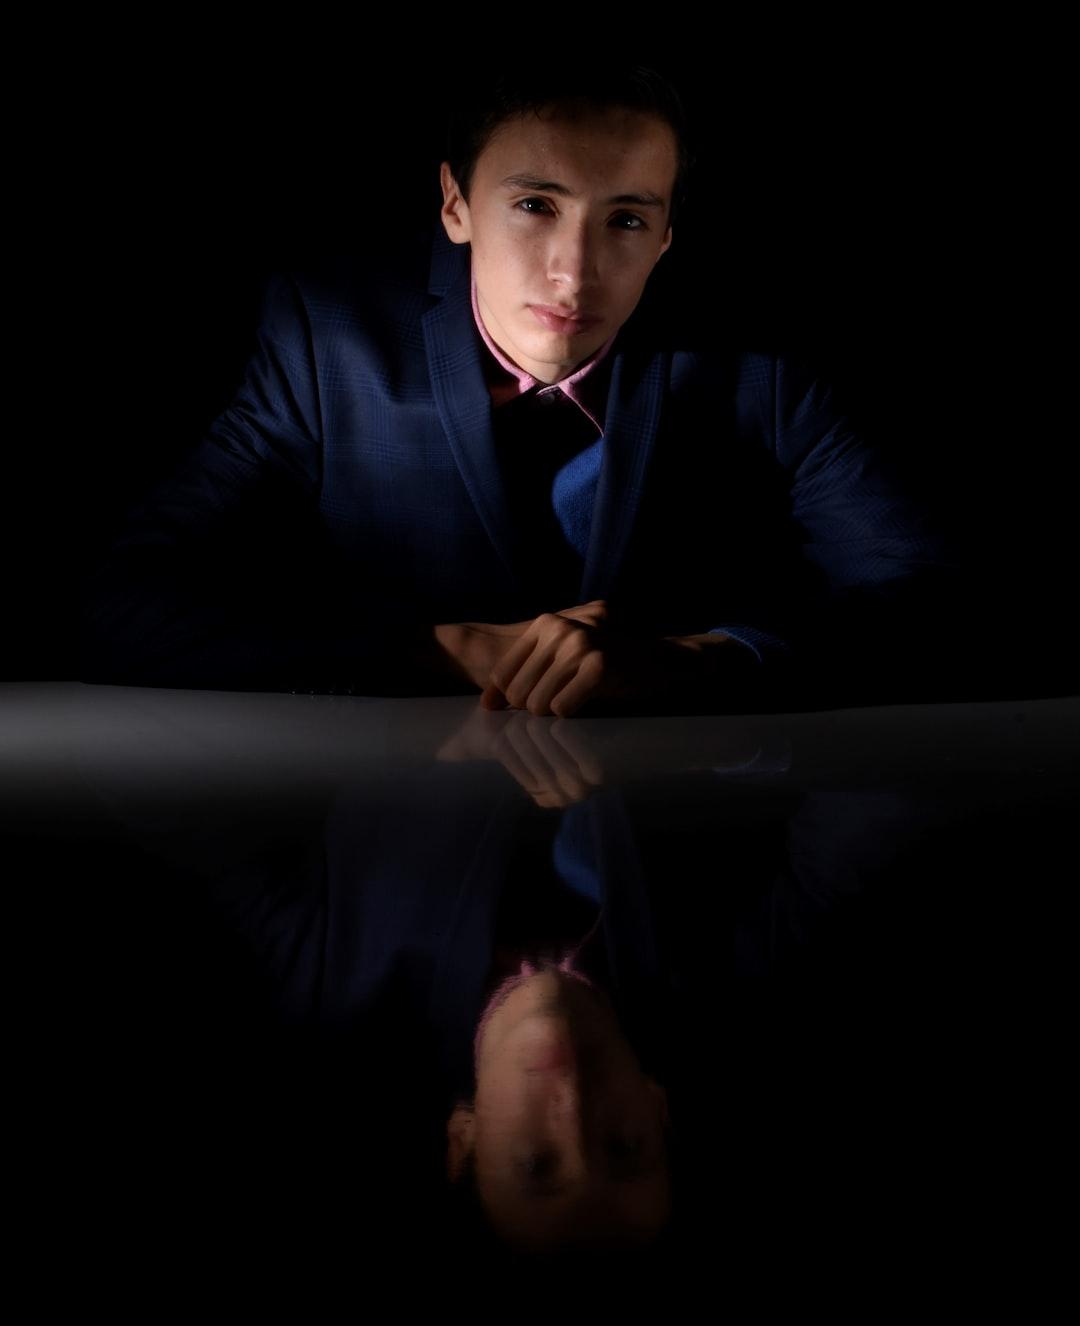 Boy into the dark